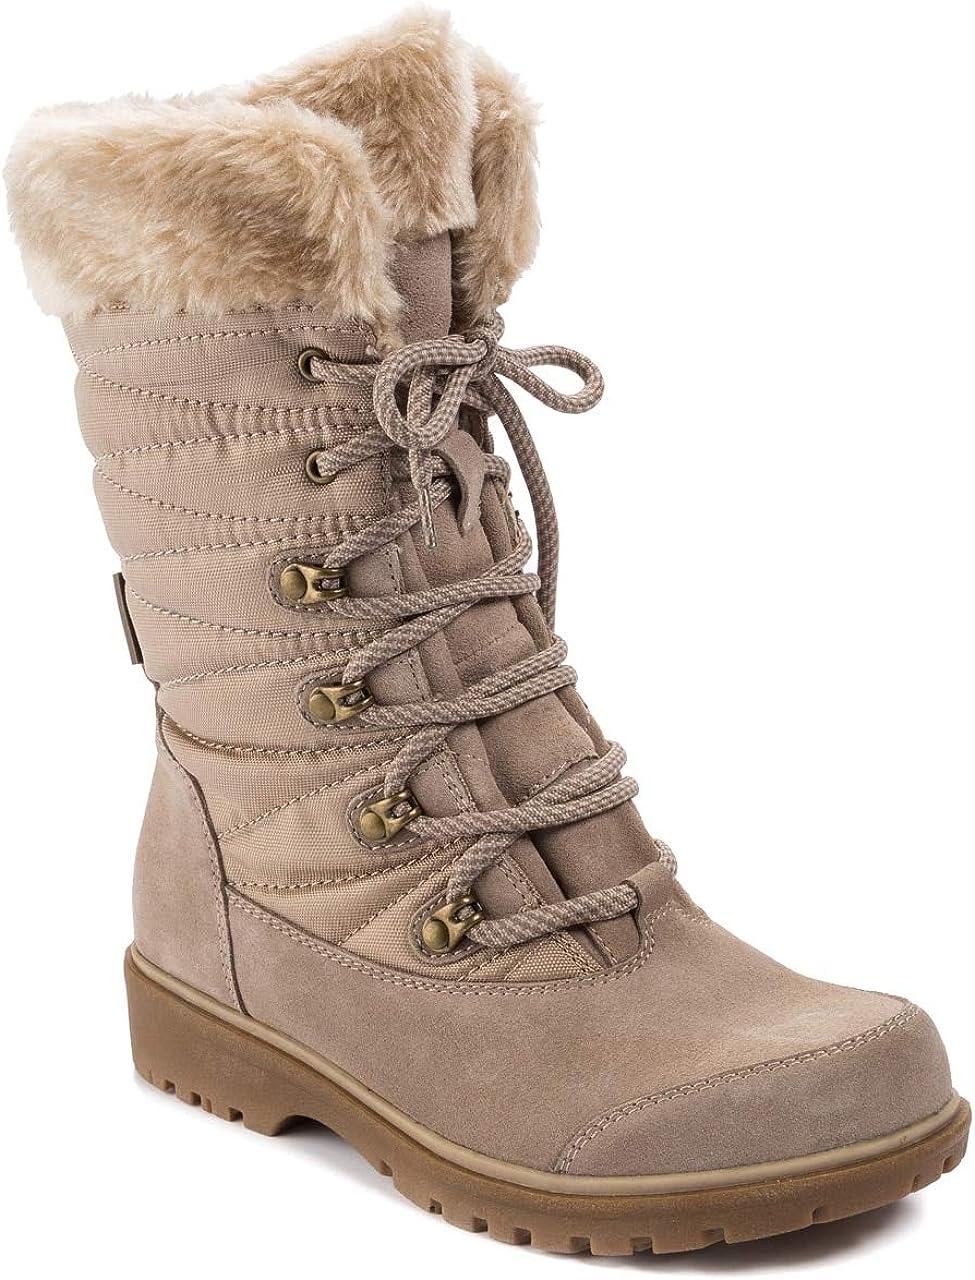 BareTraps Womens El Paso Mall Satin wate Washington Mall Leather Mid-Calf Round Toe Weat Cold